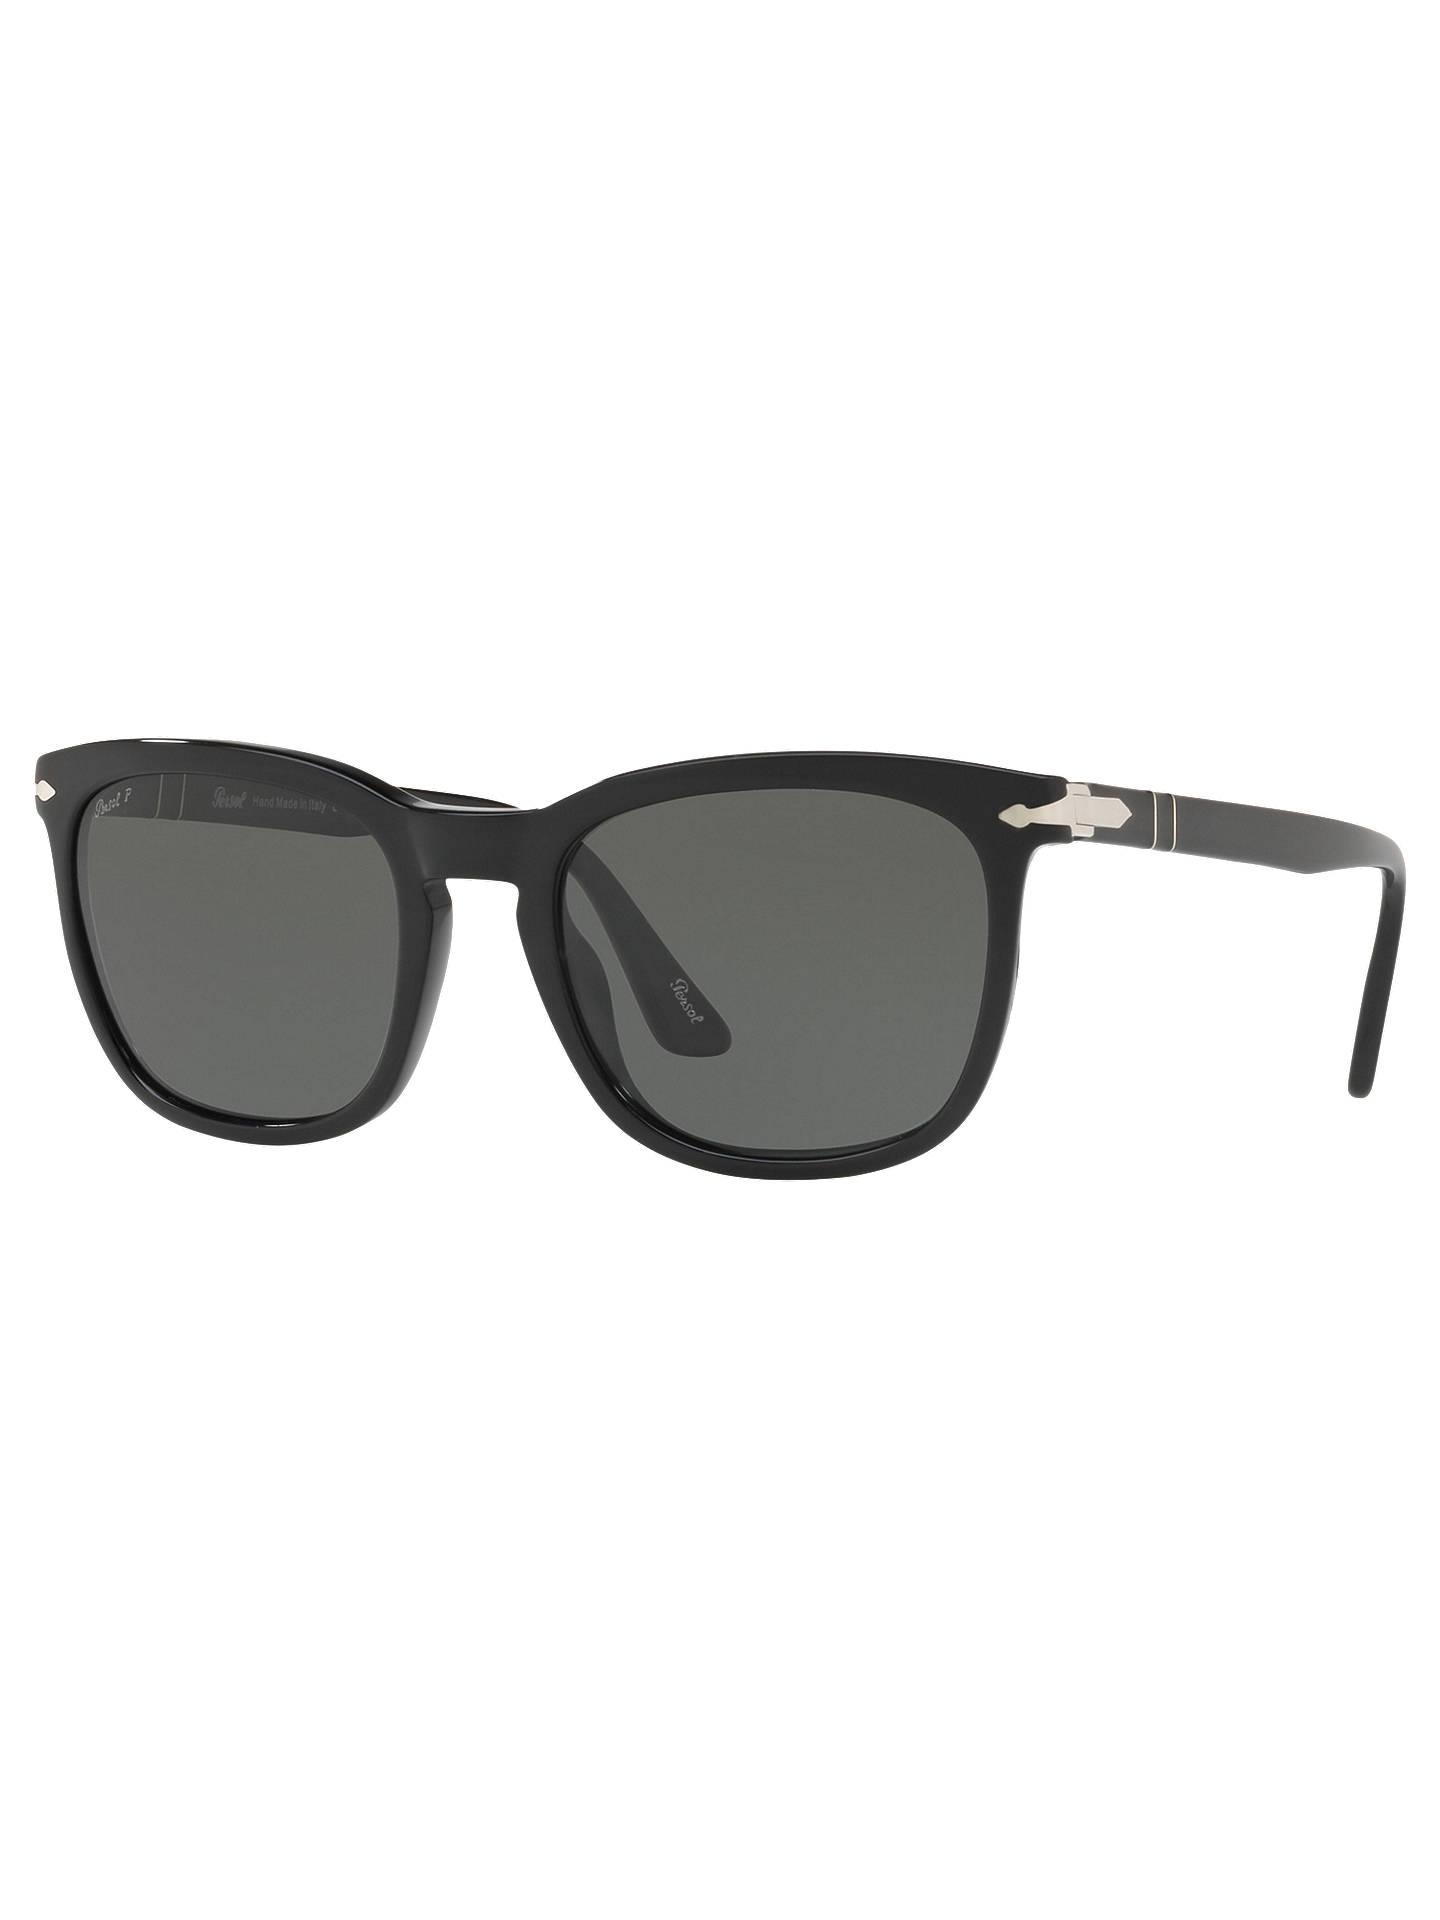 a7c868f6bc Persol PO3193S Men s D-Frame Sunglasses at John Lewis   Partners